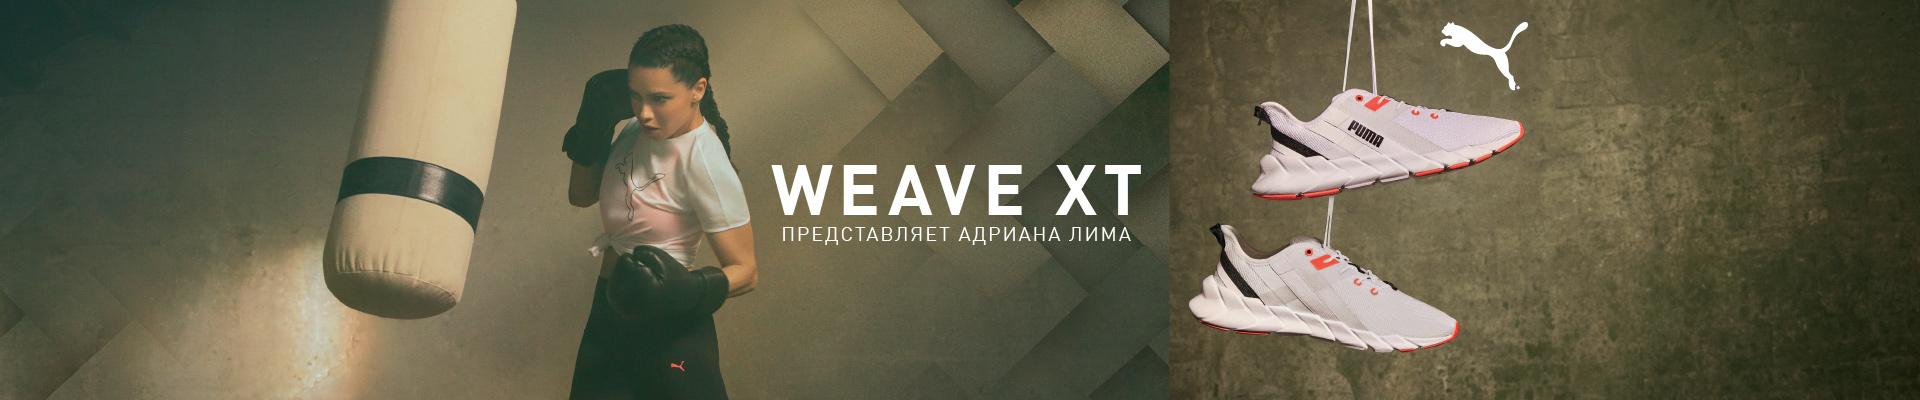 Weave XT Wn